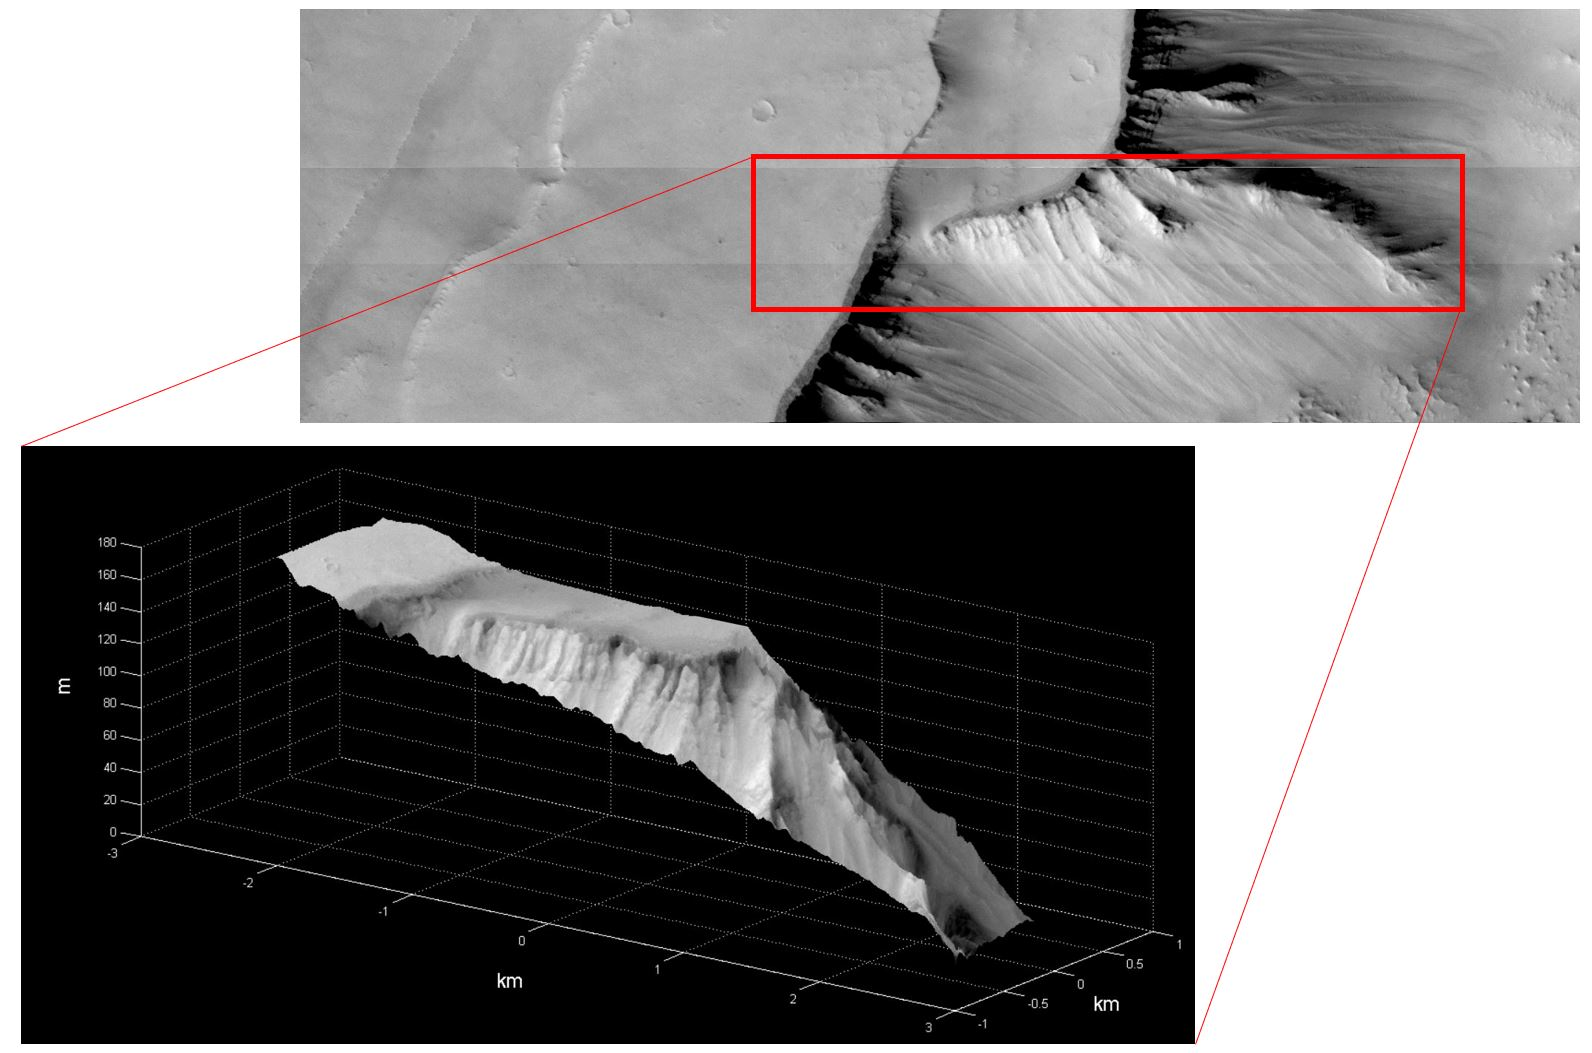 Prima ricostruzione 3D di Exomars. Credit: ESA/Roscosmos/ExoMars/CaSSIS/UniBE